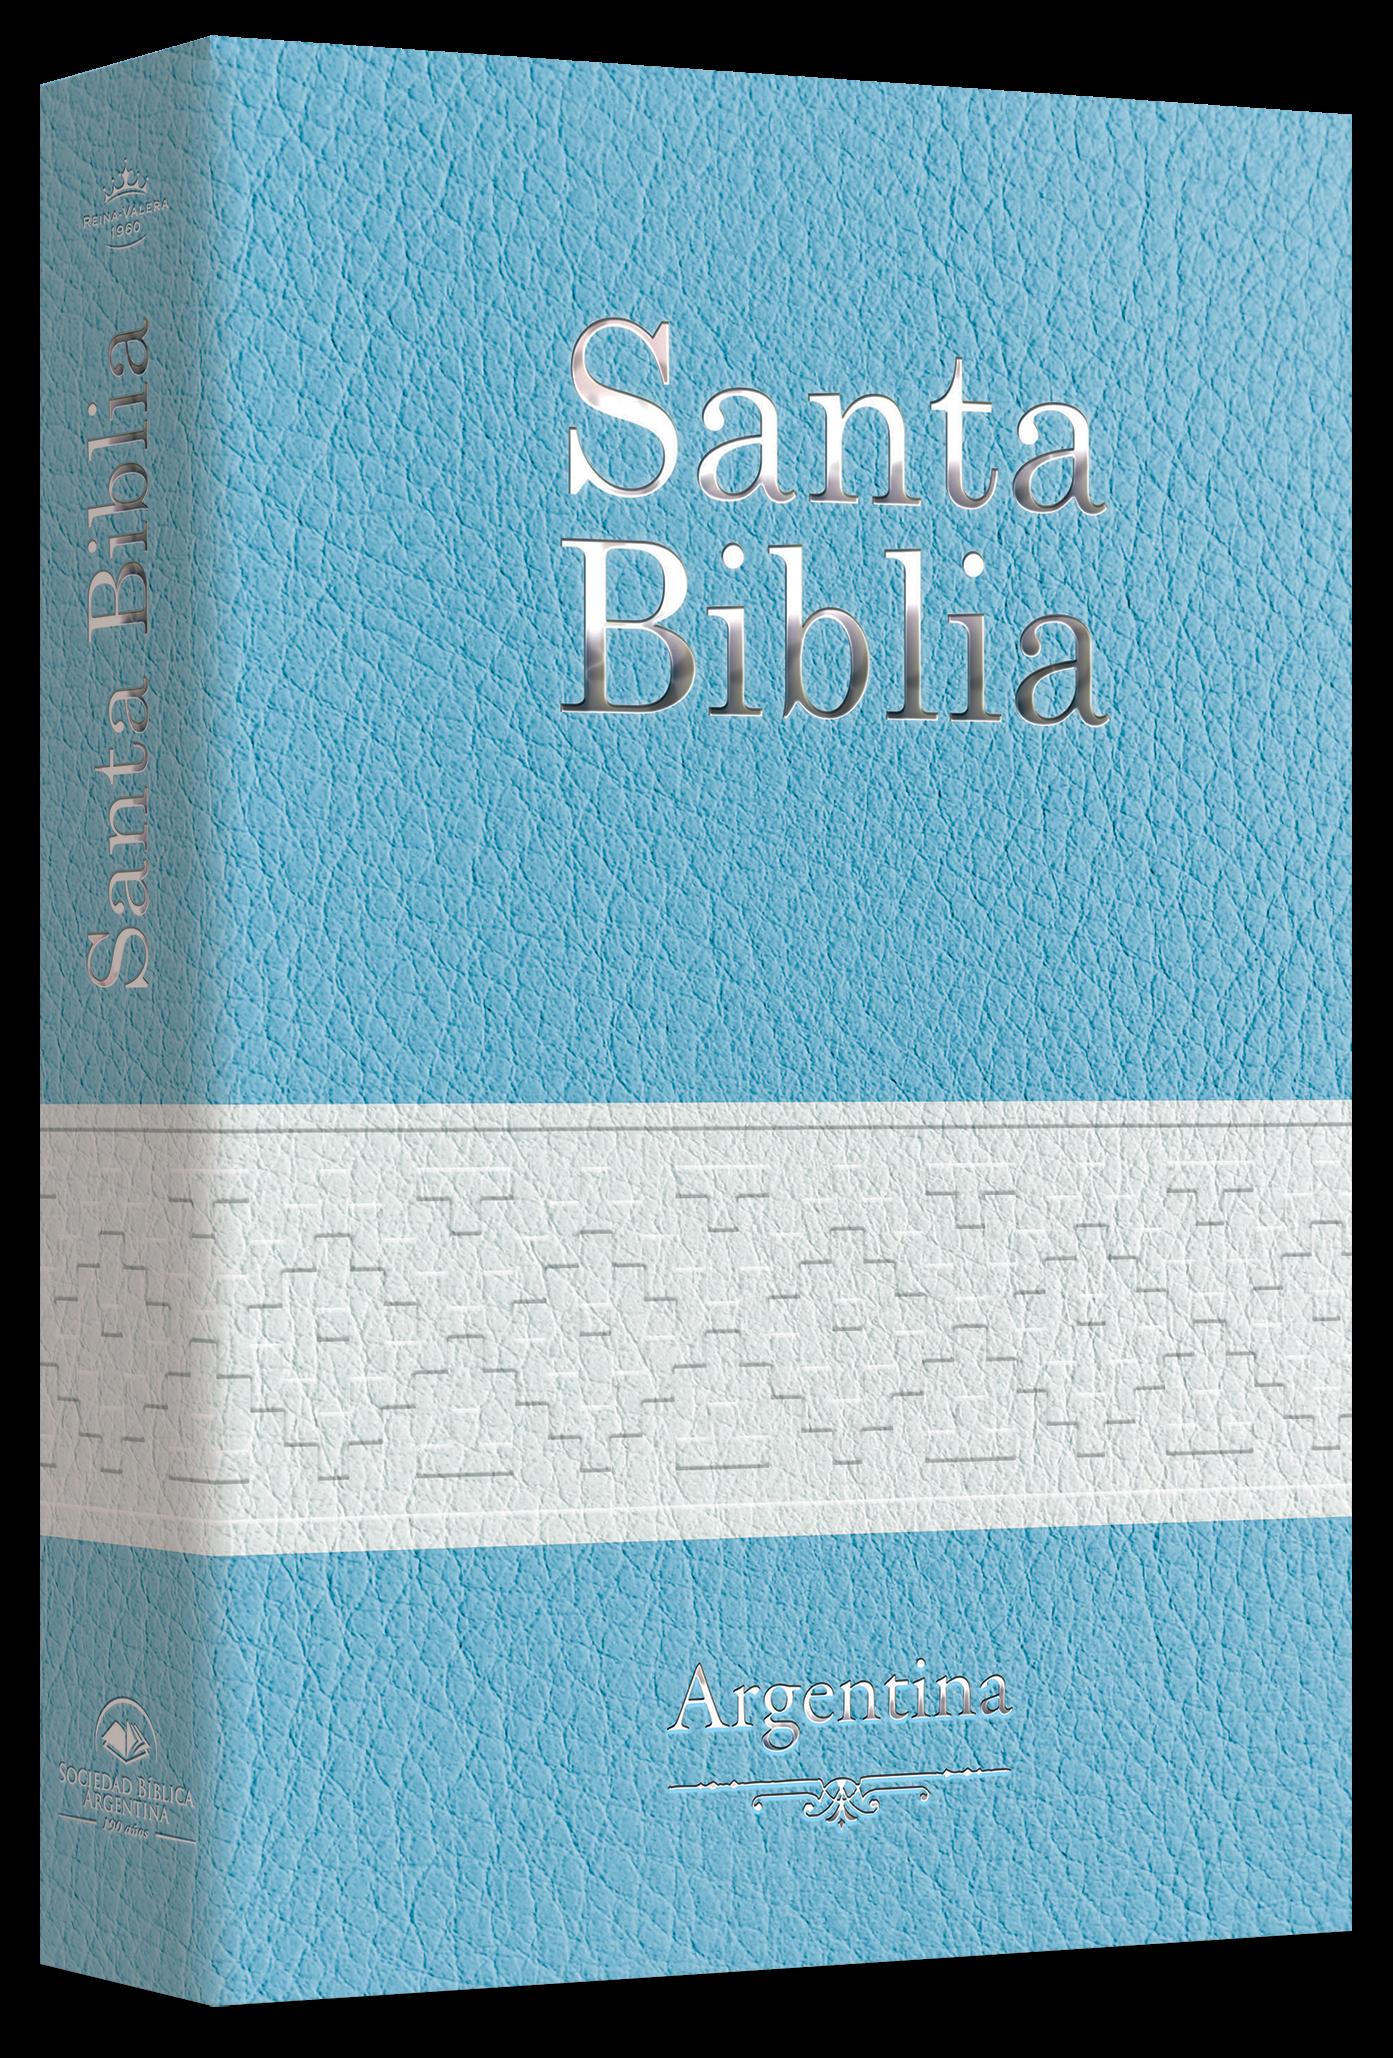 santa-biblia-argentina-01